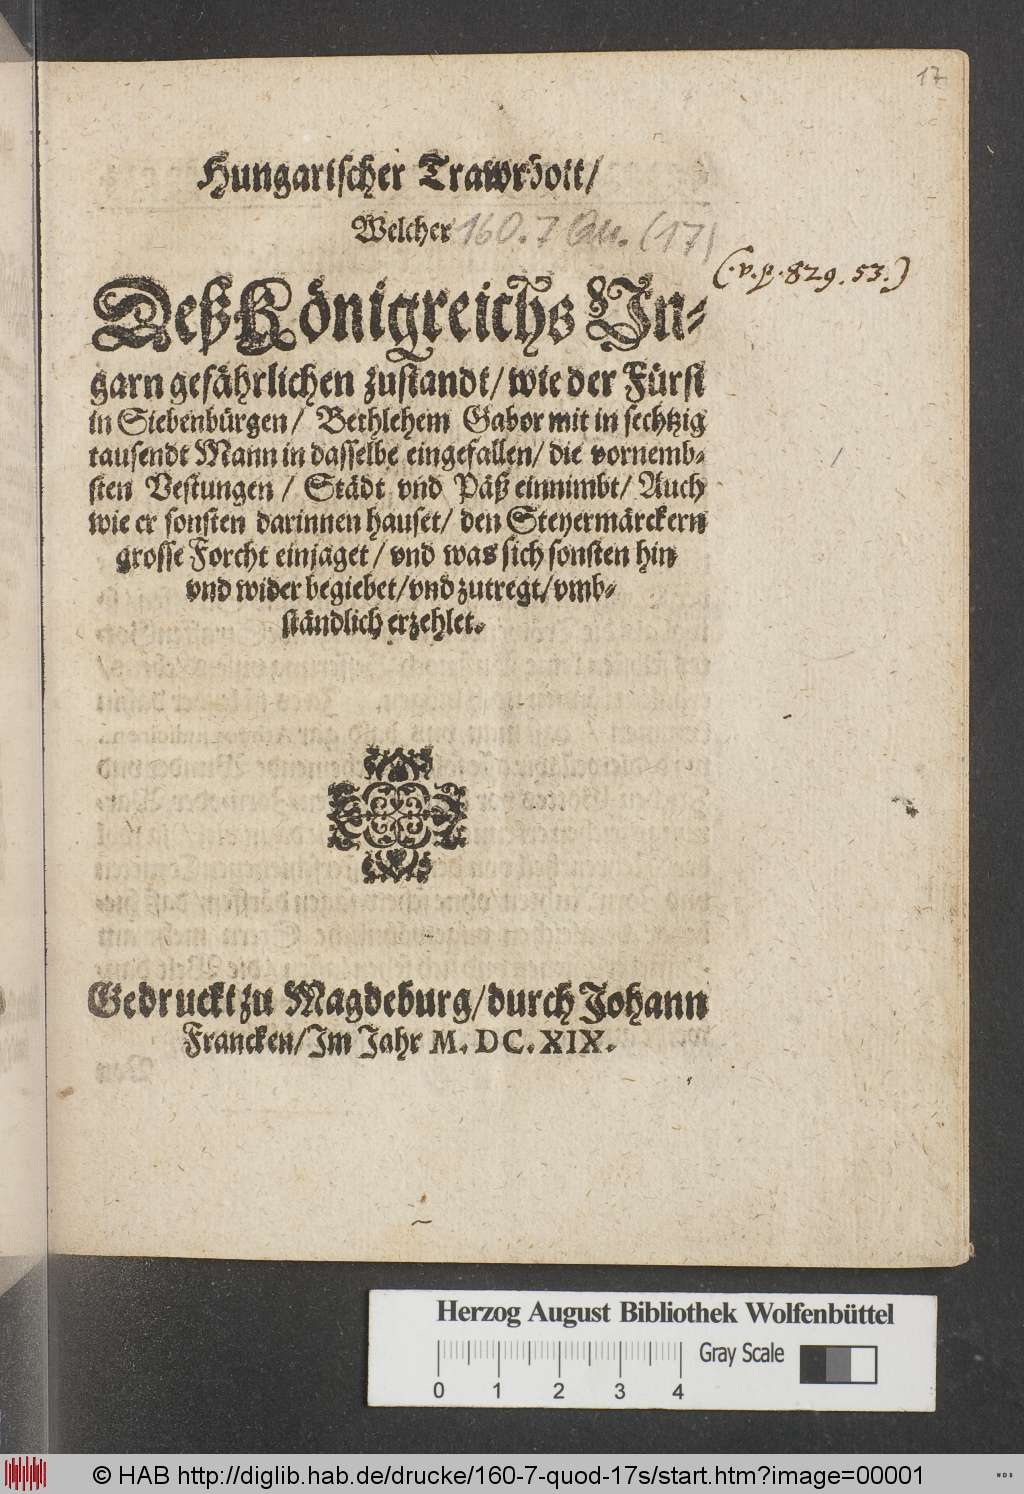 https://diglib.hab.de/drucke/160-7-quod-17s/00001.jpg